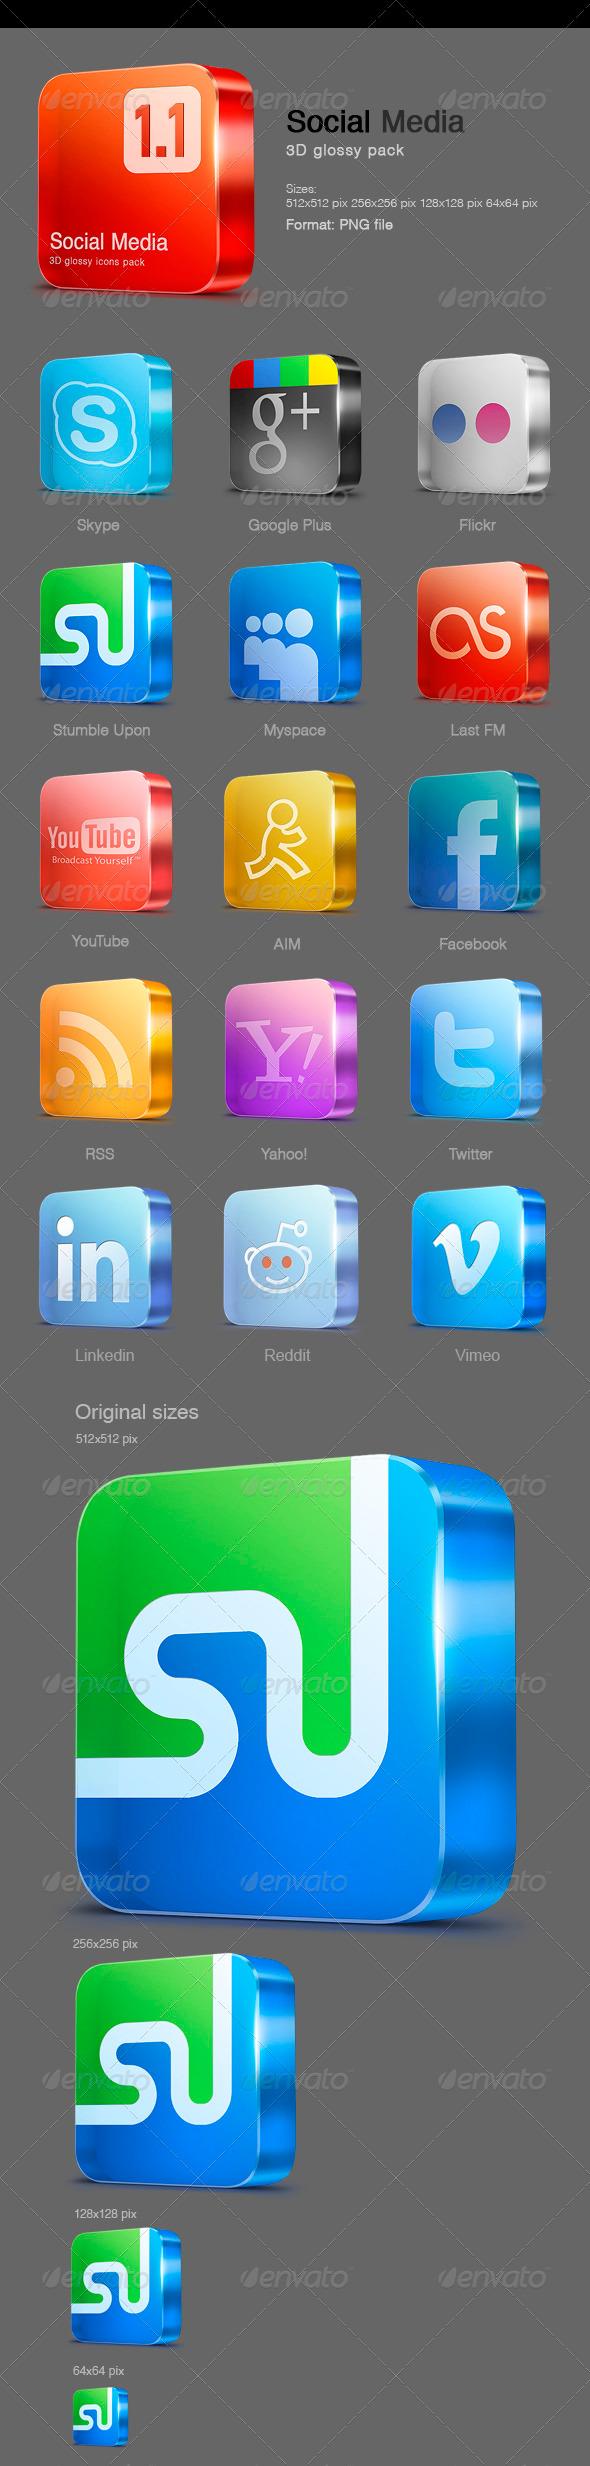 15 Glossy Social Media icons v 1.1 - Web Icons